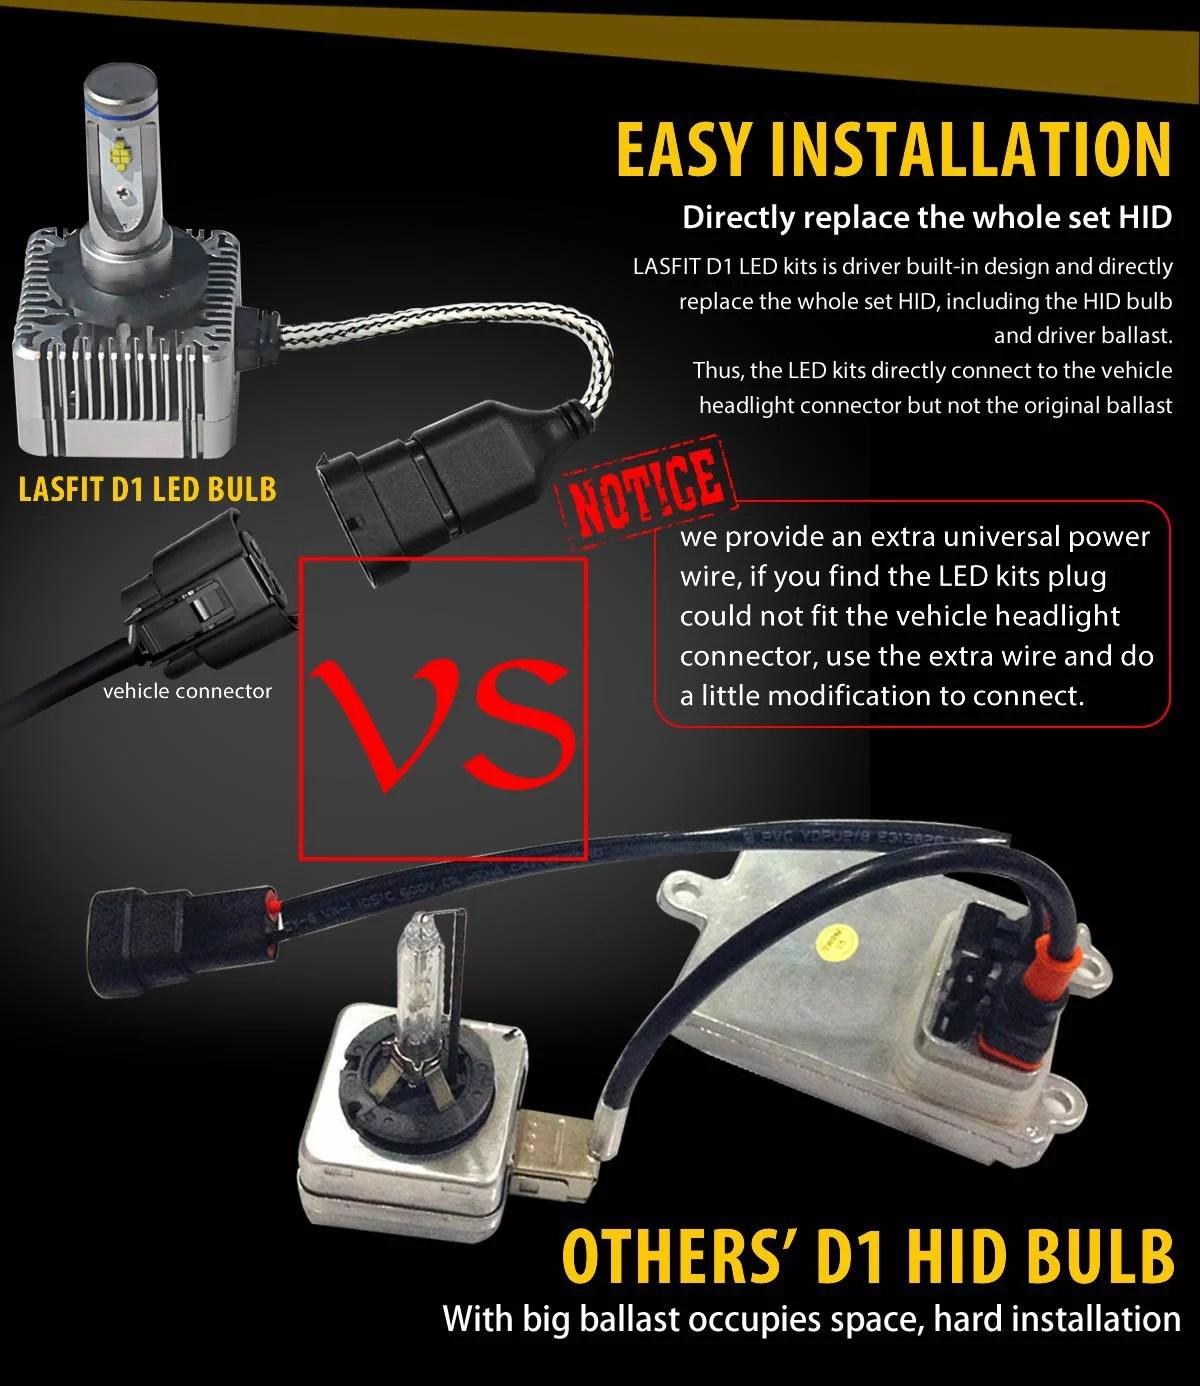 hight resolution of lasfit d1s d1r d3s d3r d1 d3 led headlight bulbs high low beam 72w 7600lm 6000k cool white pack of 2 walmart com